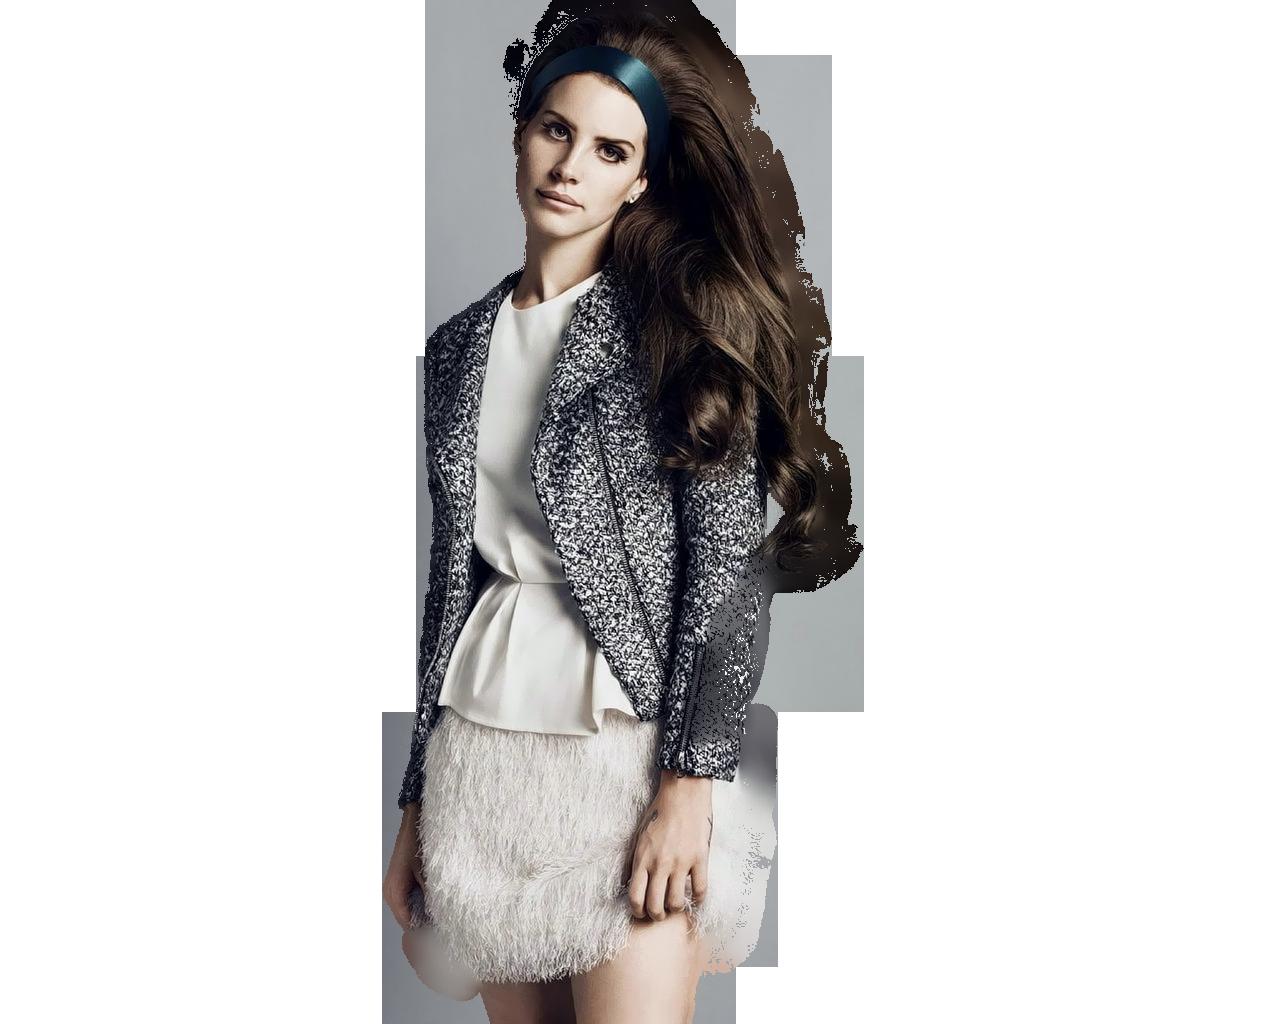 Lana Del Rey PNG by phuongkutenkool on DeviantArt